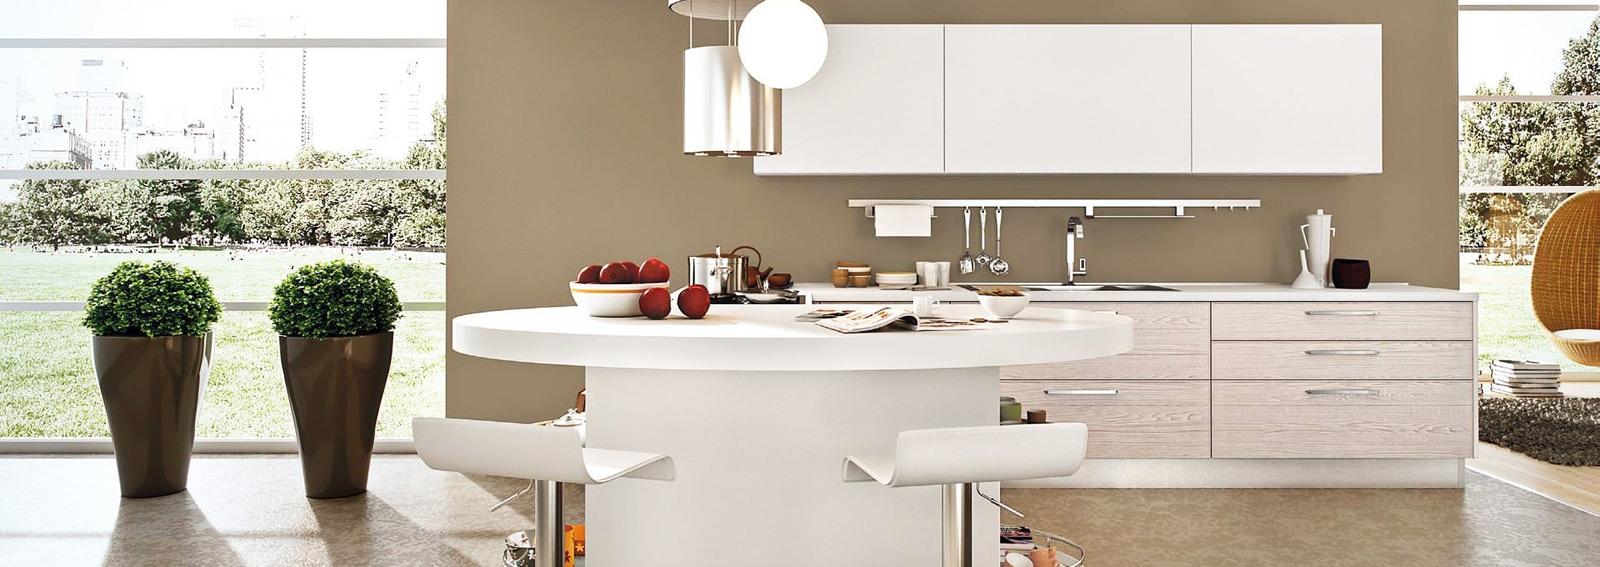 Cucine Piu Belle Moderne. Emejing Cucine Bellissime Moderne Ideas Us ...